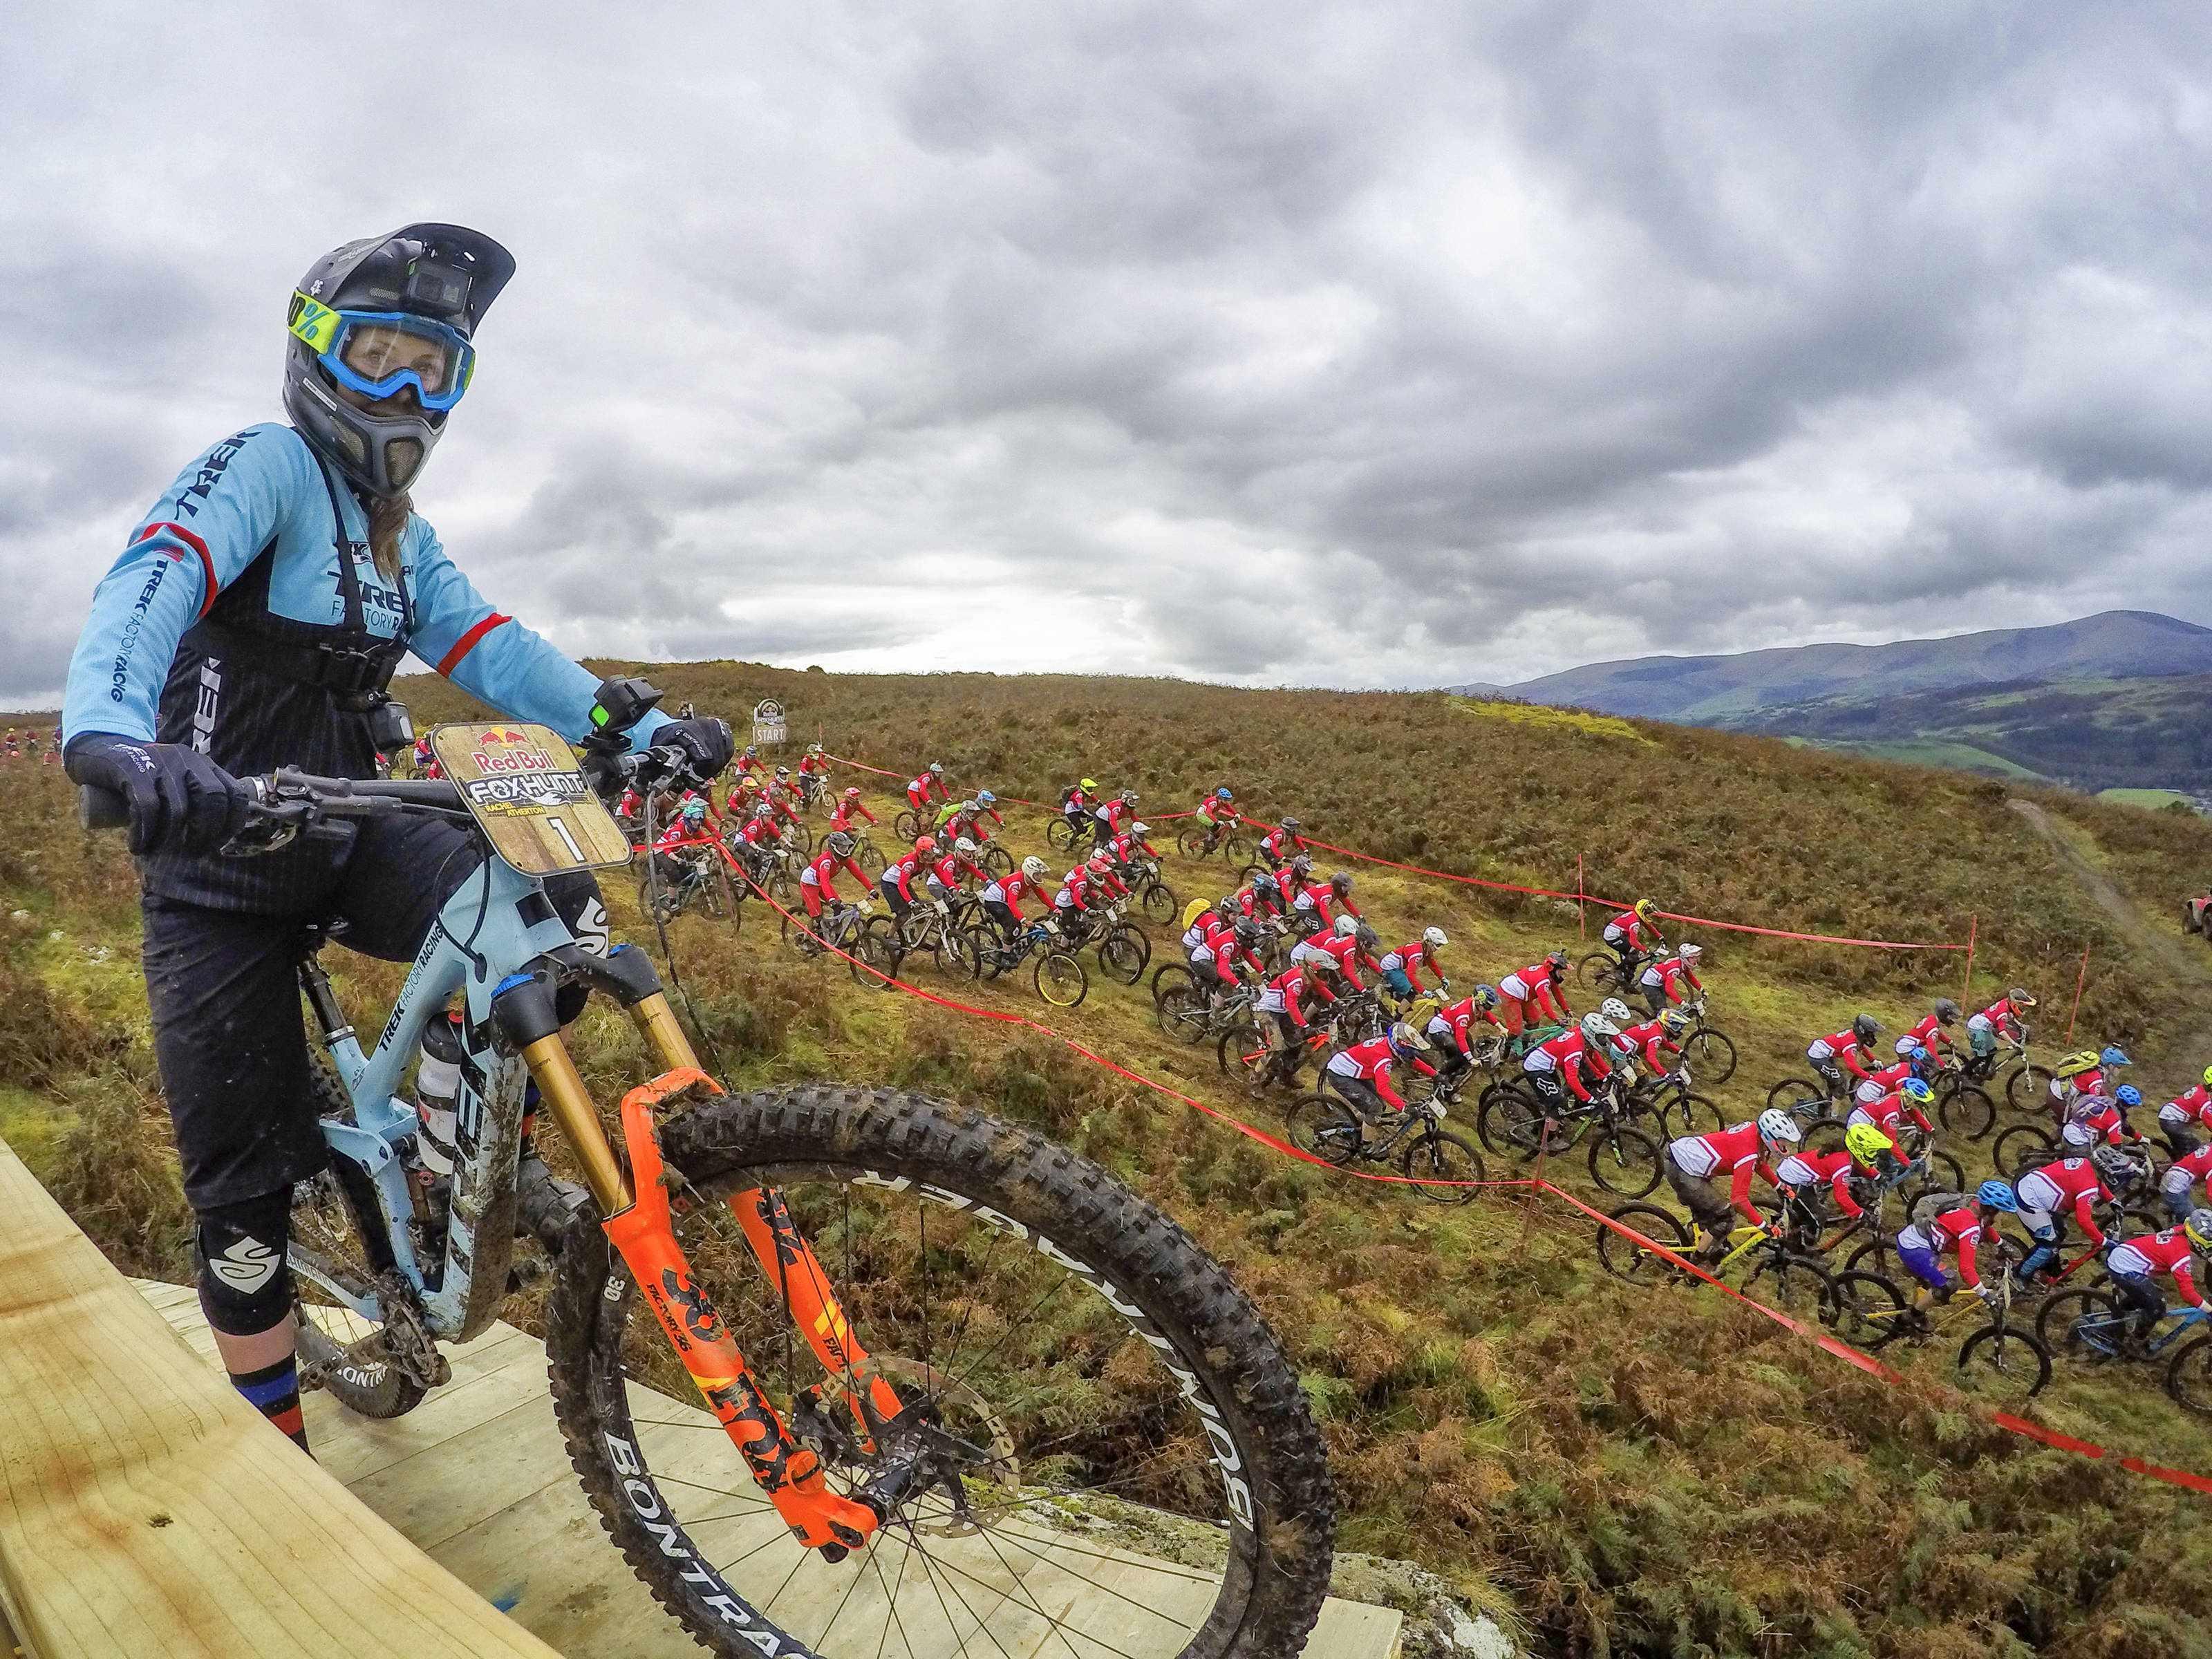 Katy Winton riding Trek Slash at the Red Bull Fox Hunt in North Wales